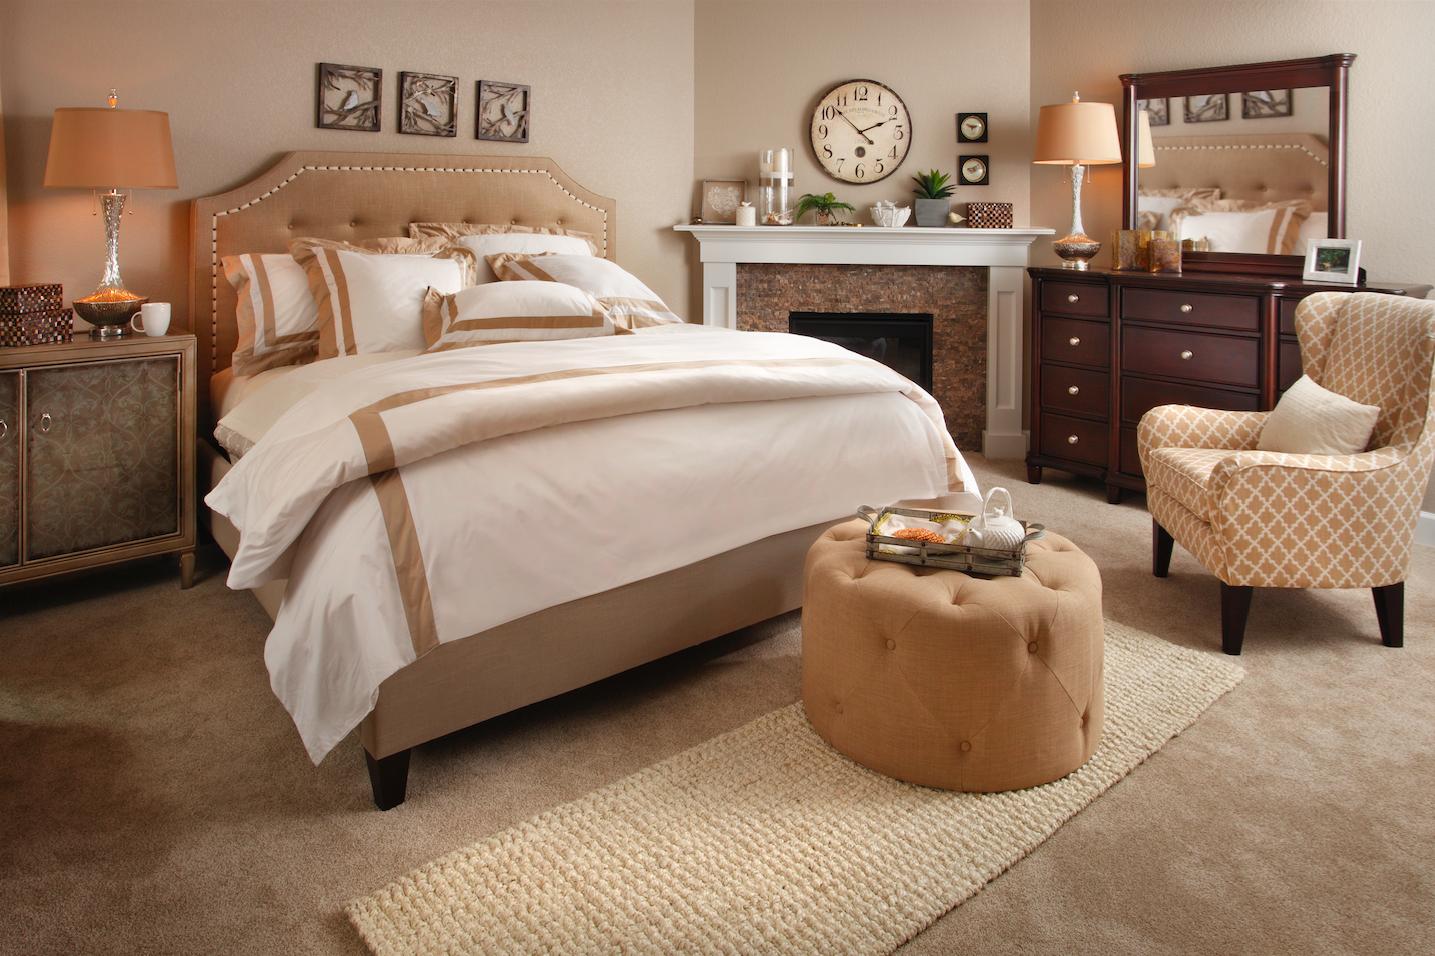 Furniture Row In Boise Id 83704